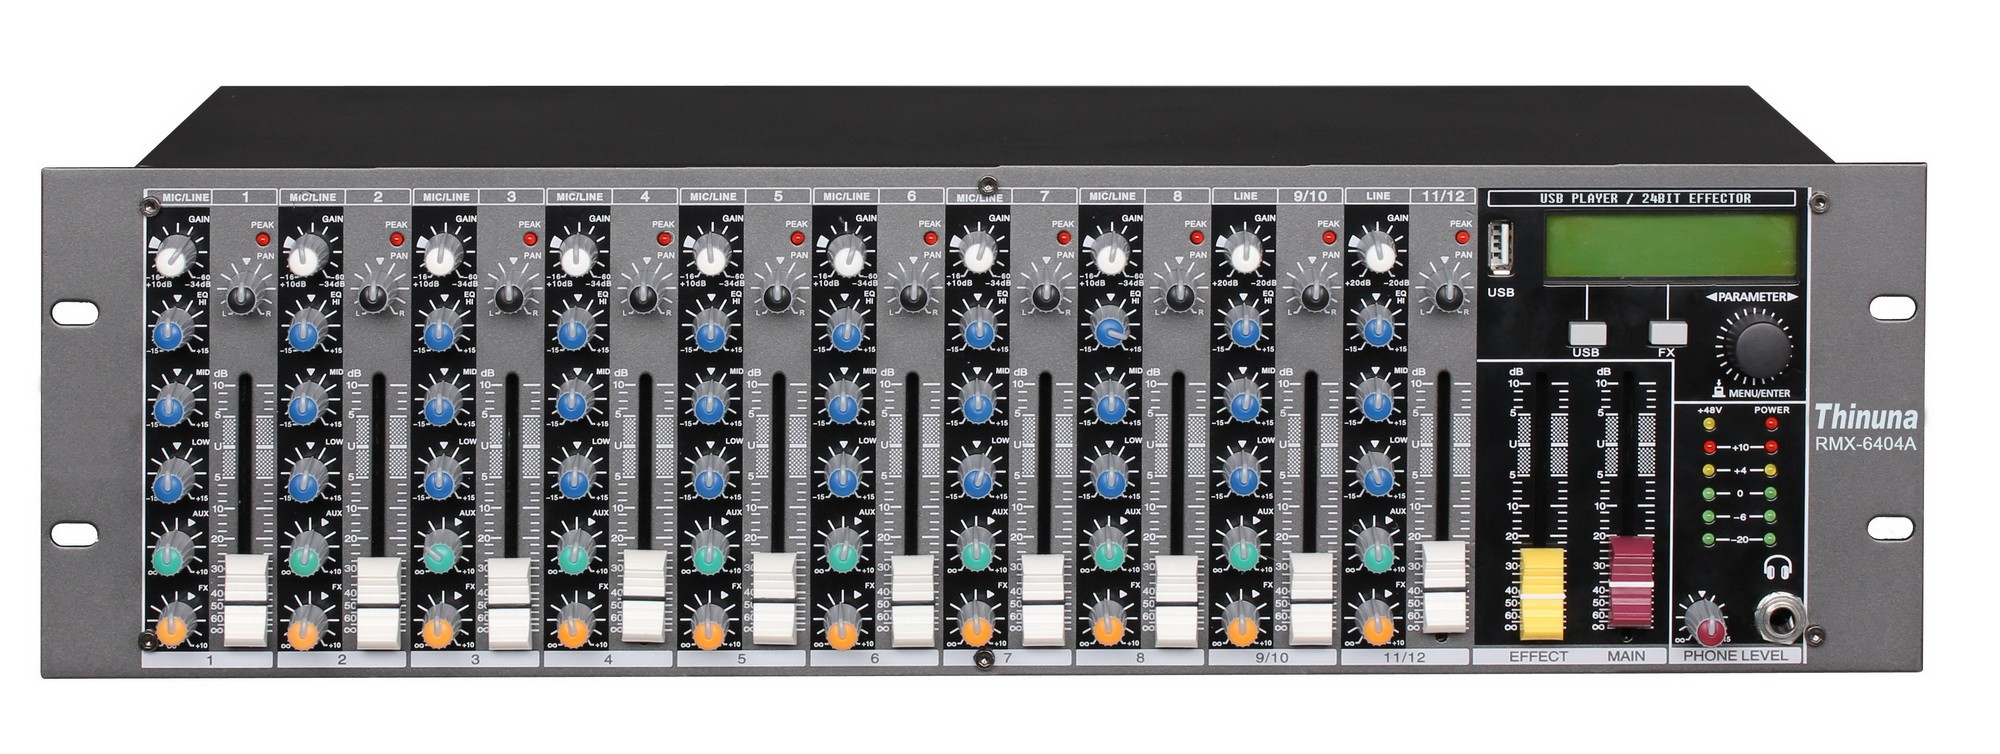 RMX-6404A Rack-Mounted Mixer